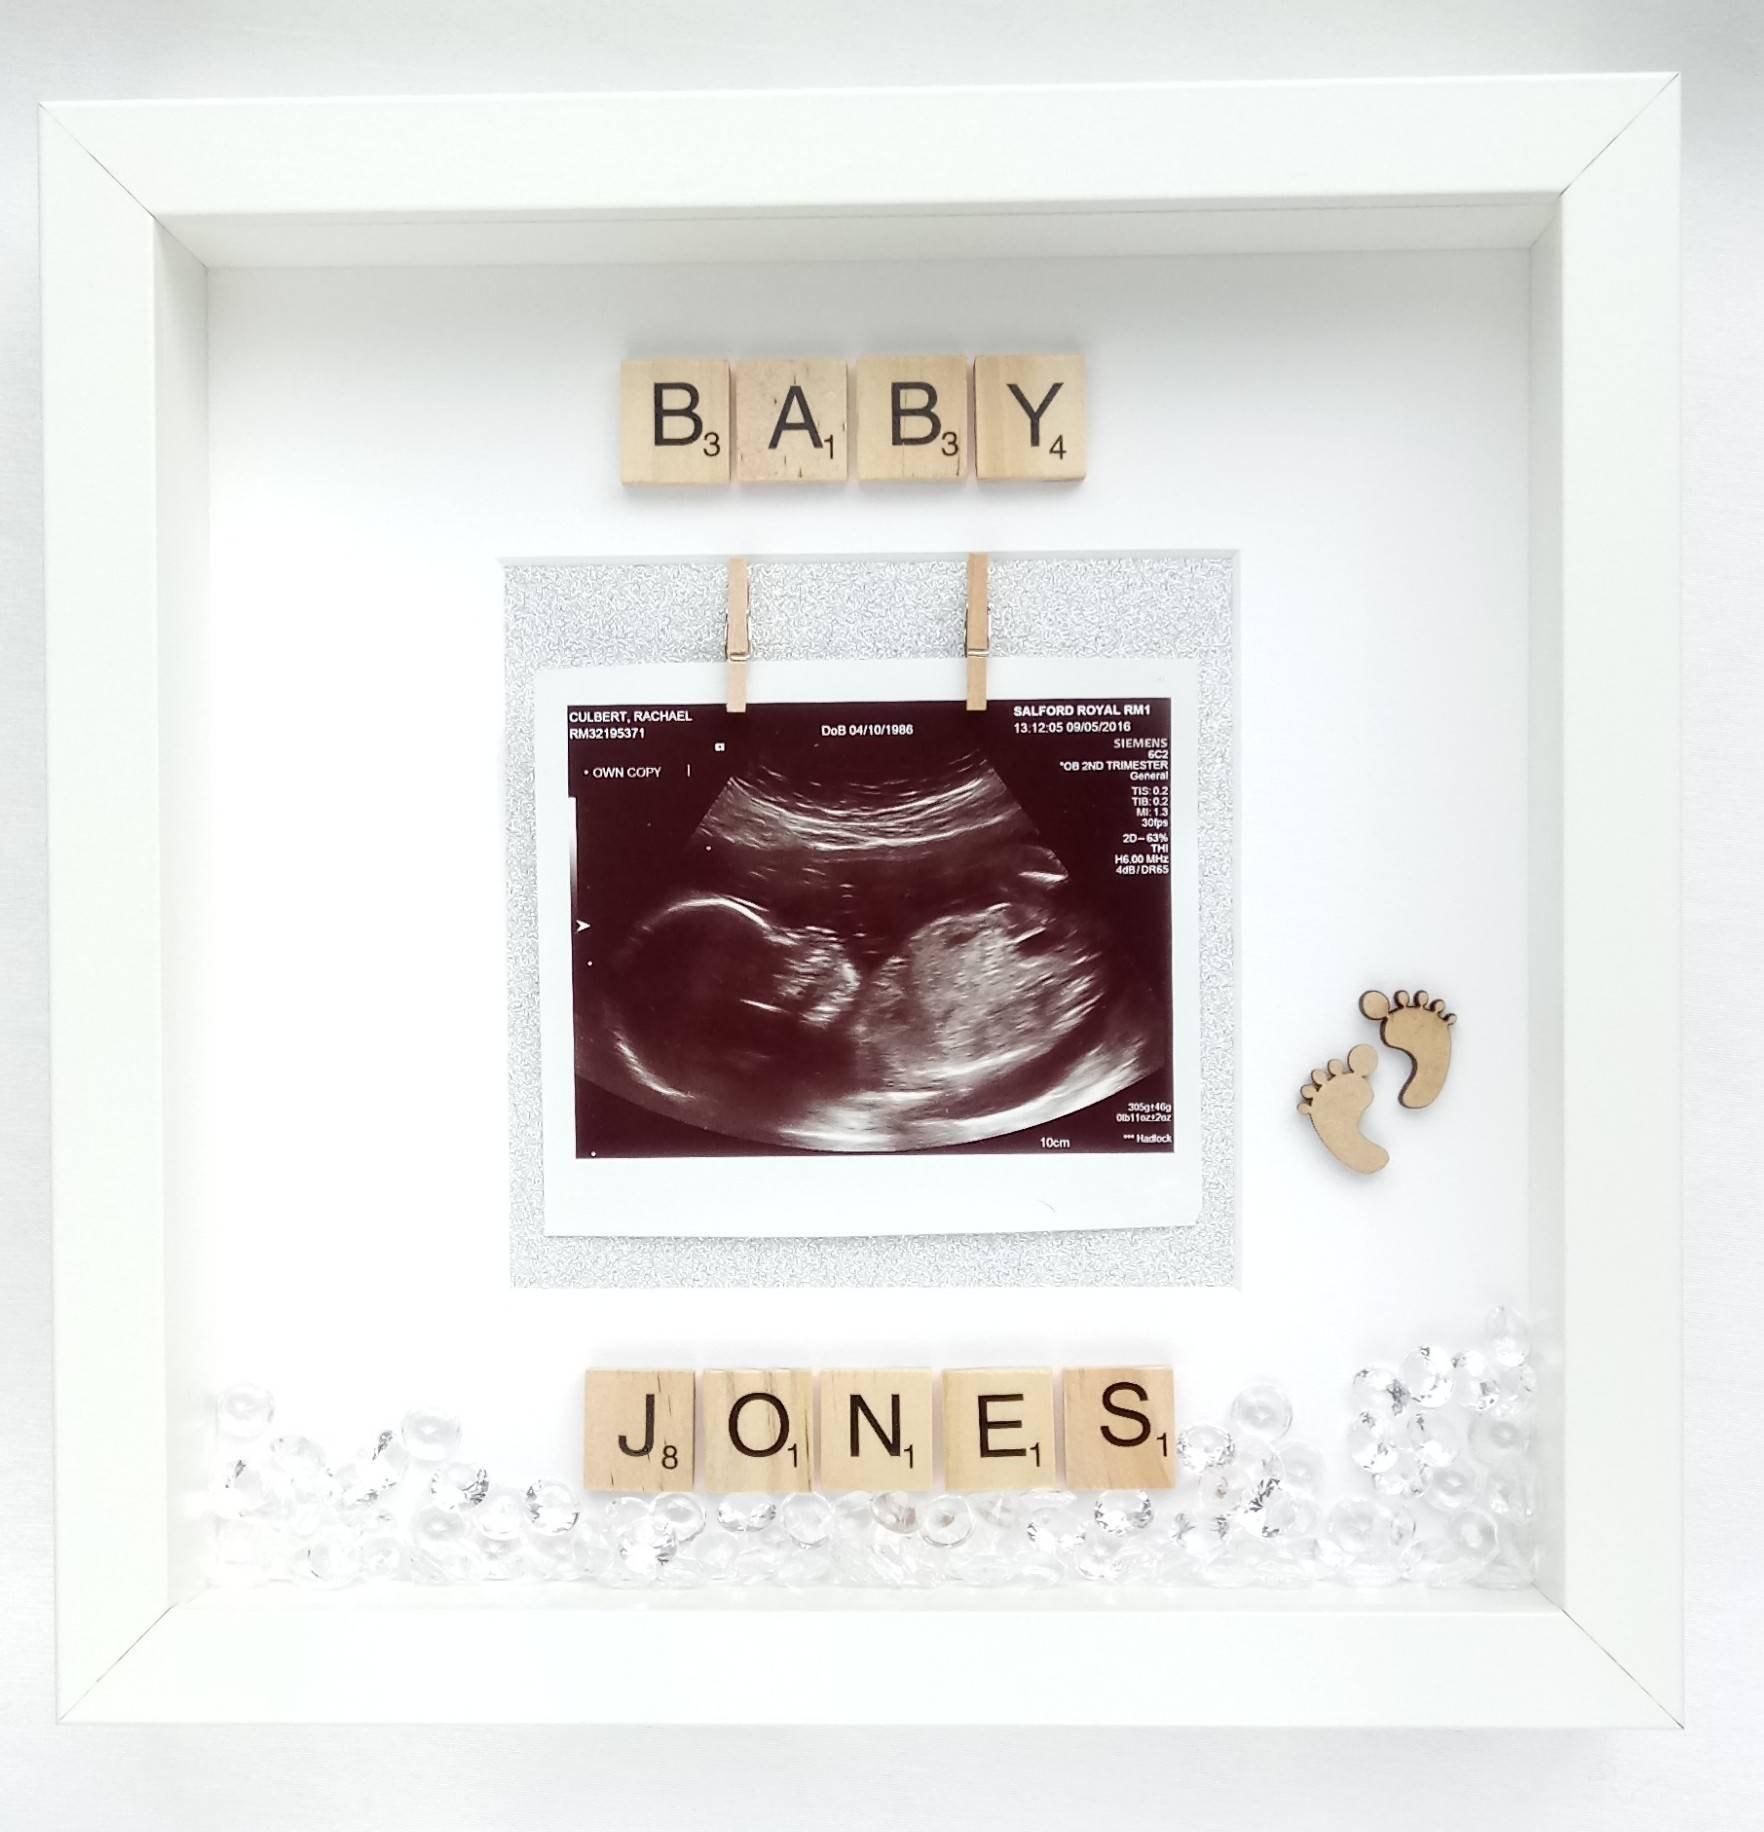 24 X 10Cm Baby Scan Photo Frame Plaque